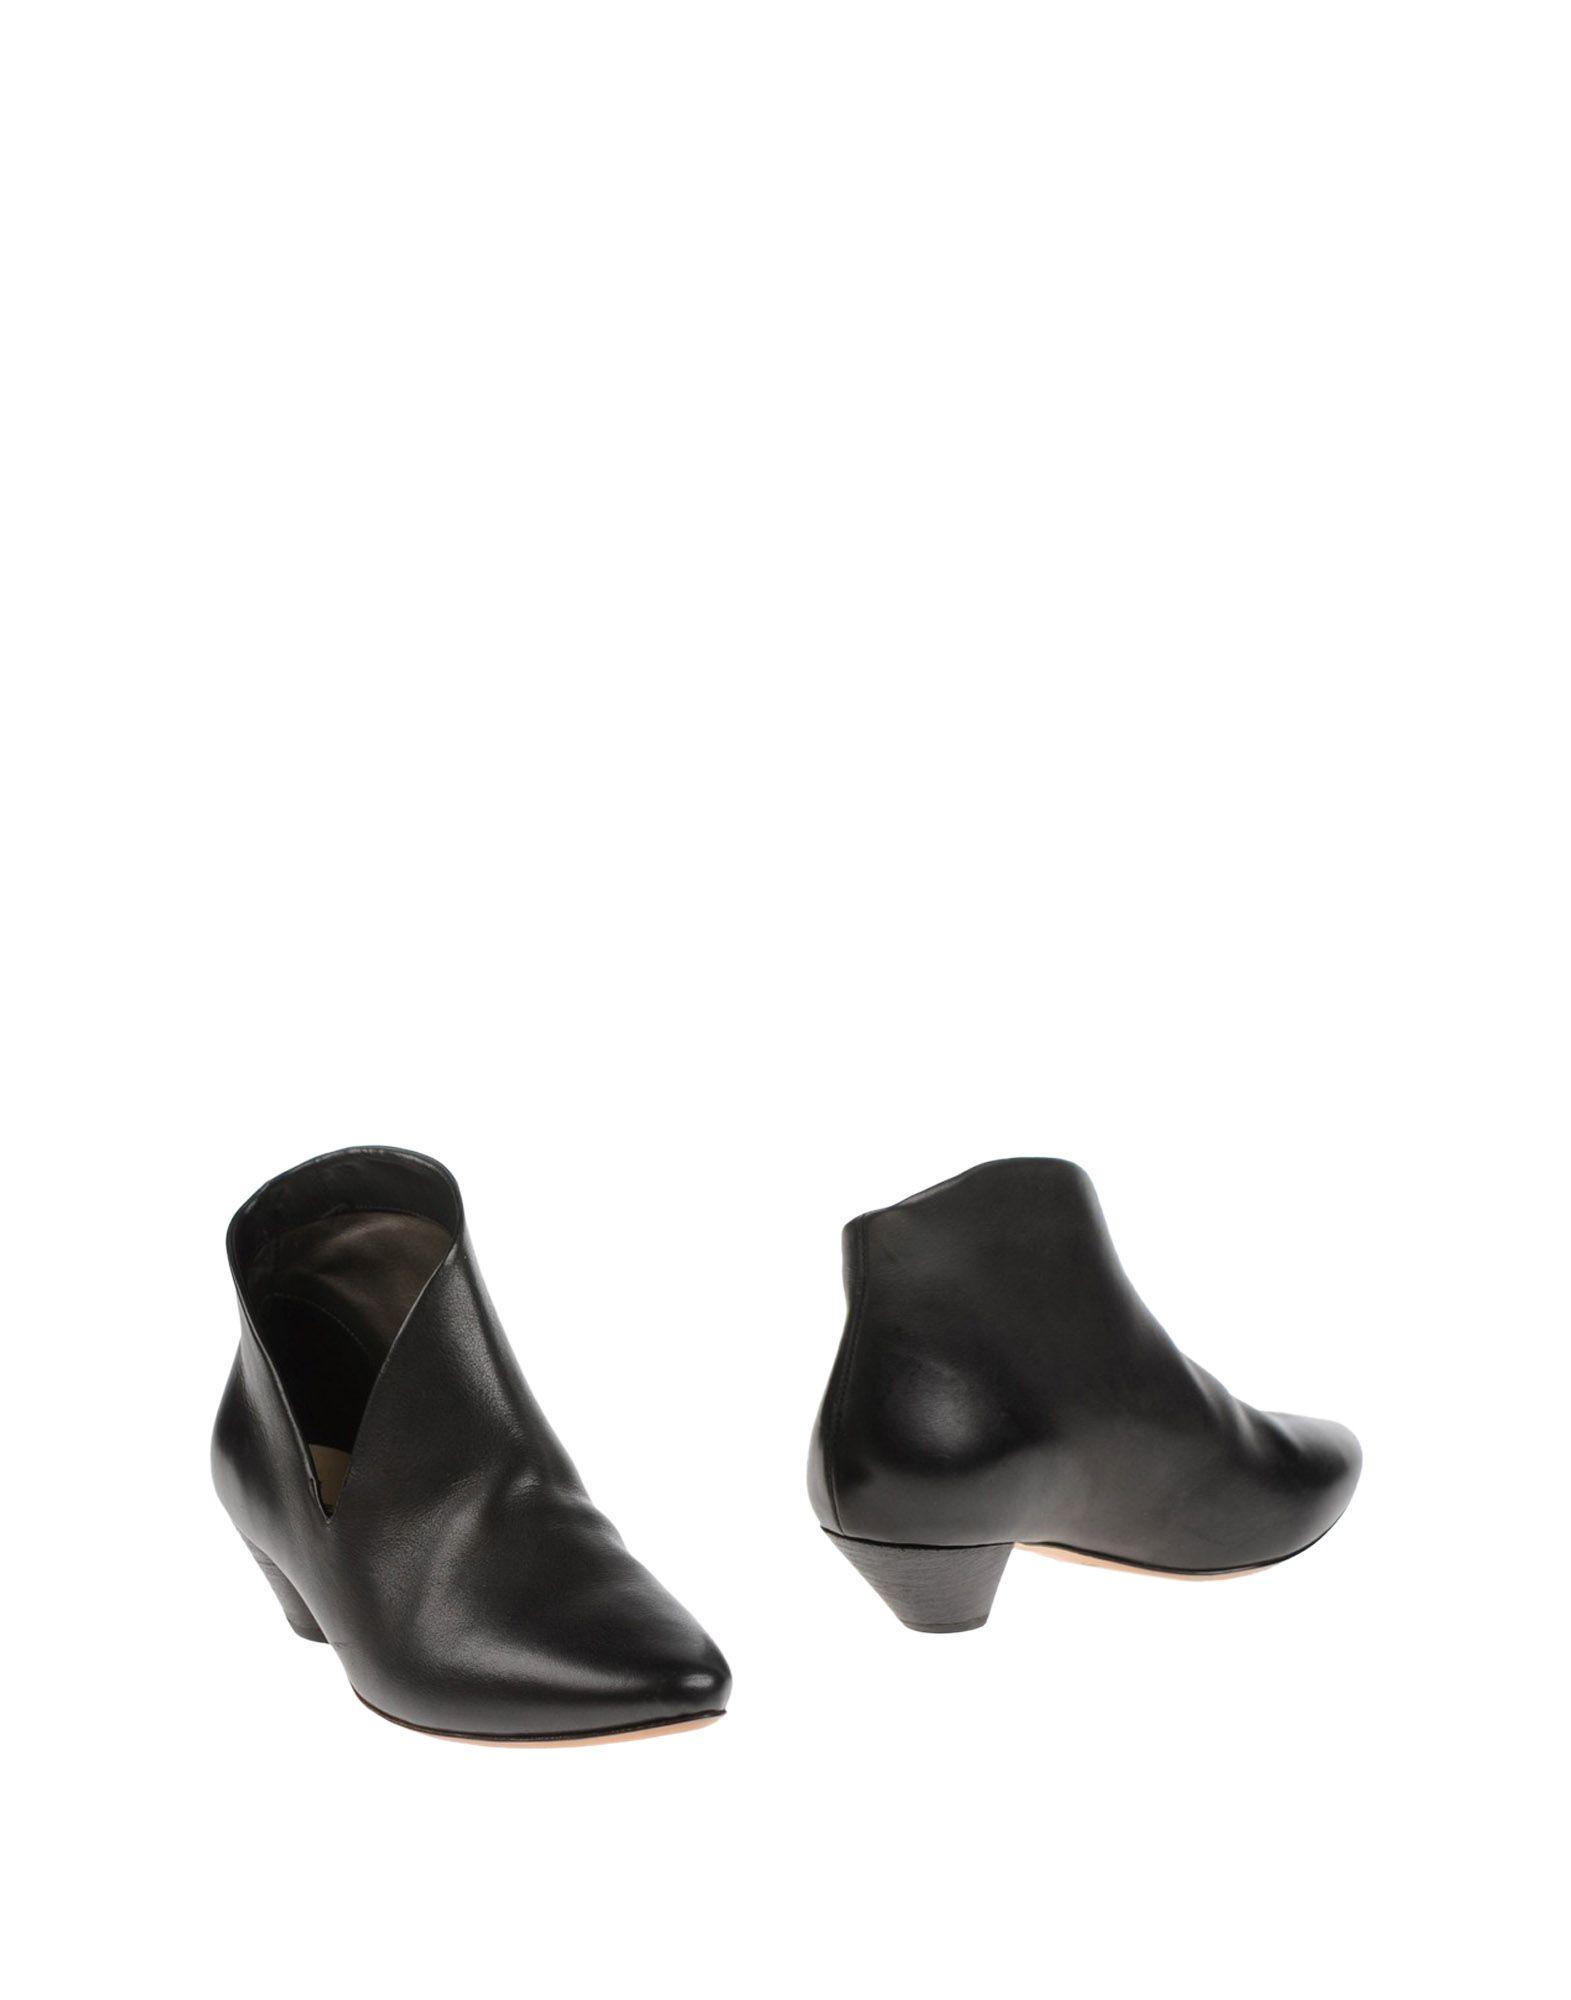 Marsèll Marsèll Ankle Boot - Women Marsèll Marsèll Ankle Boots online on  Canada - 11245834HK 7ae6cc